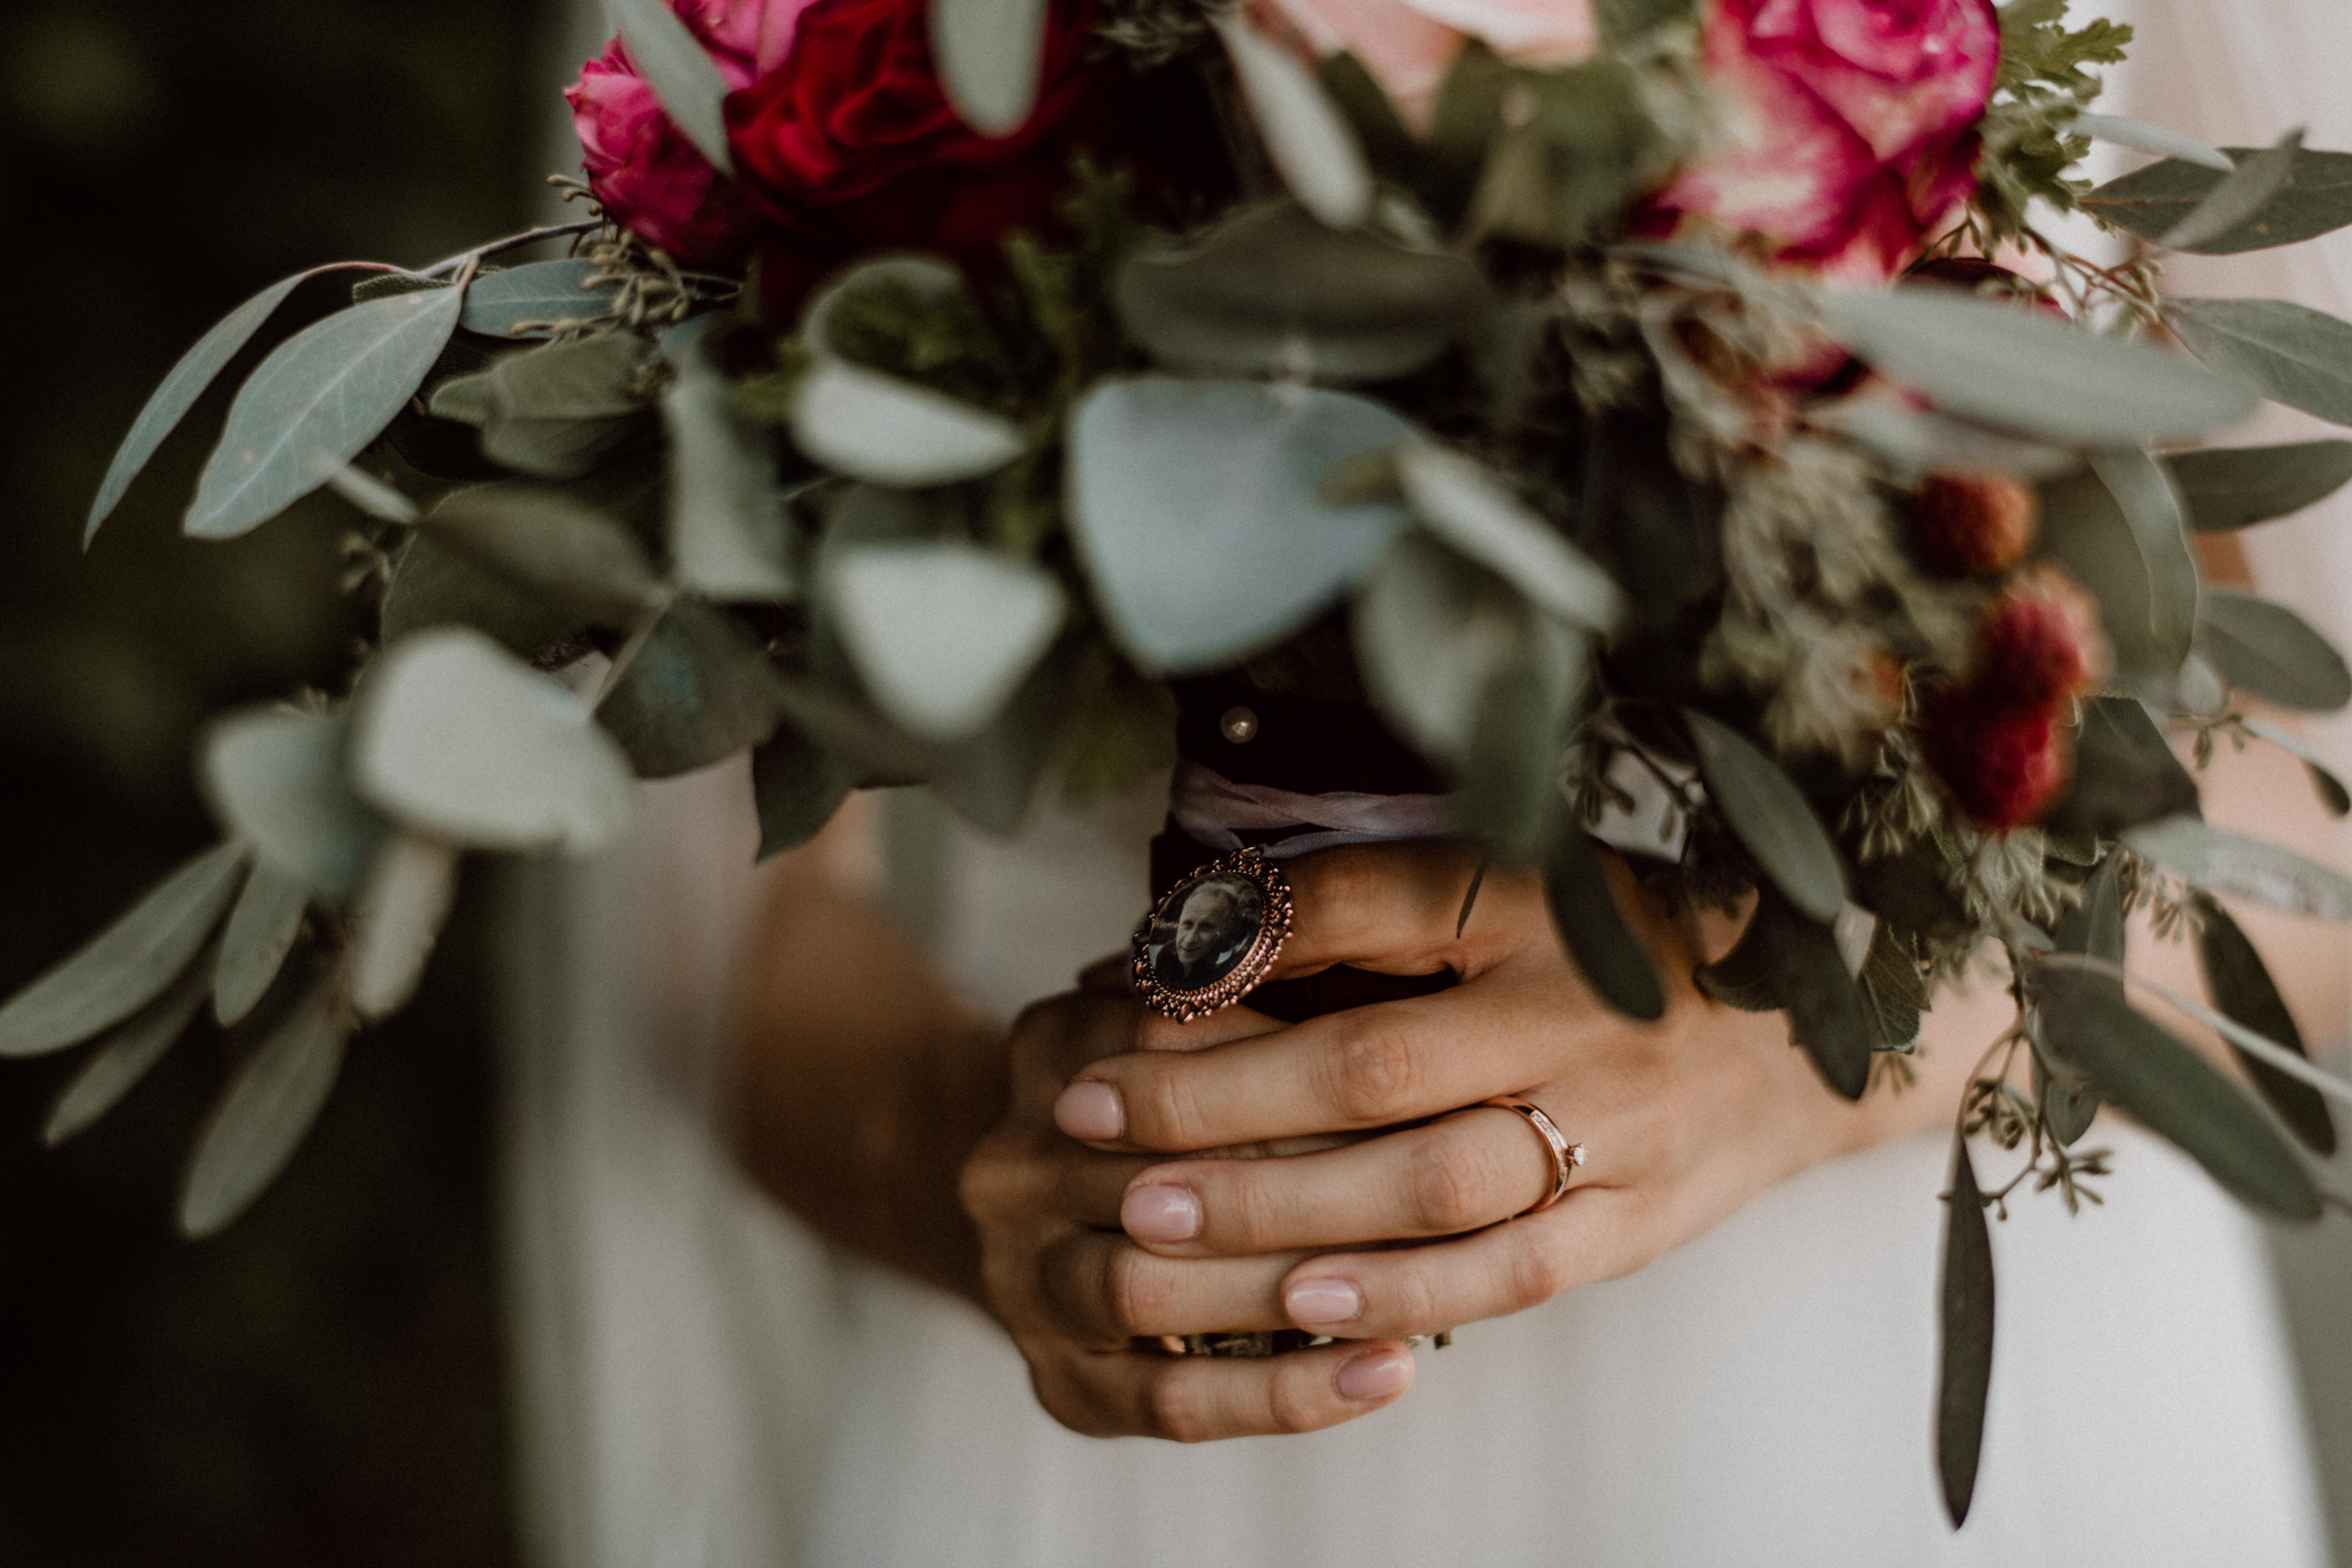 bridal bouquet sonja poehlmann photography couples muenchen bayern